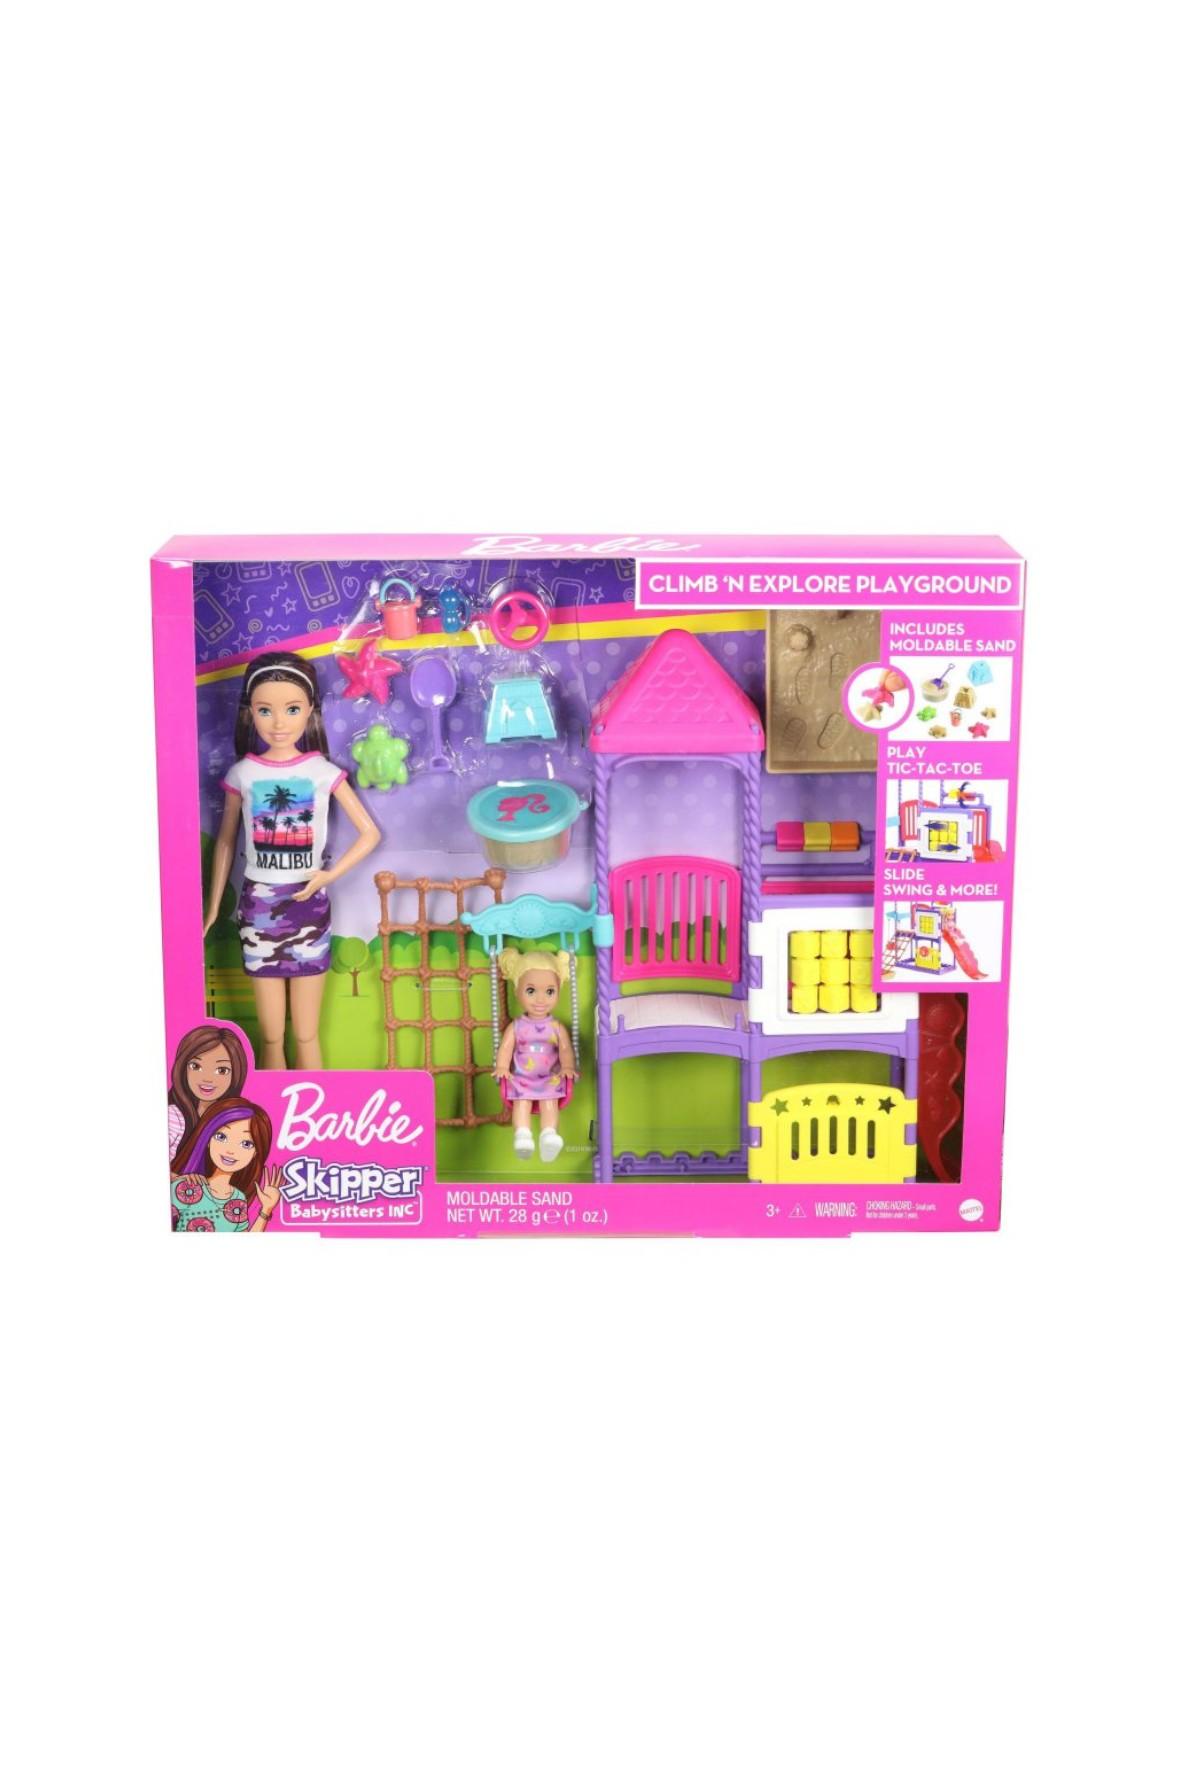 Barbie Skipper Klub opiekunek - Plac zabaw wiek 3+